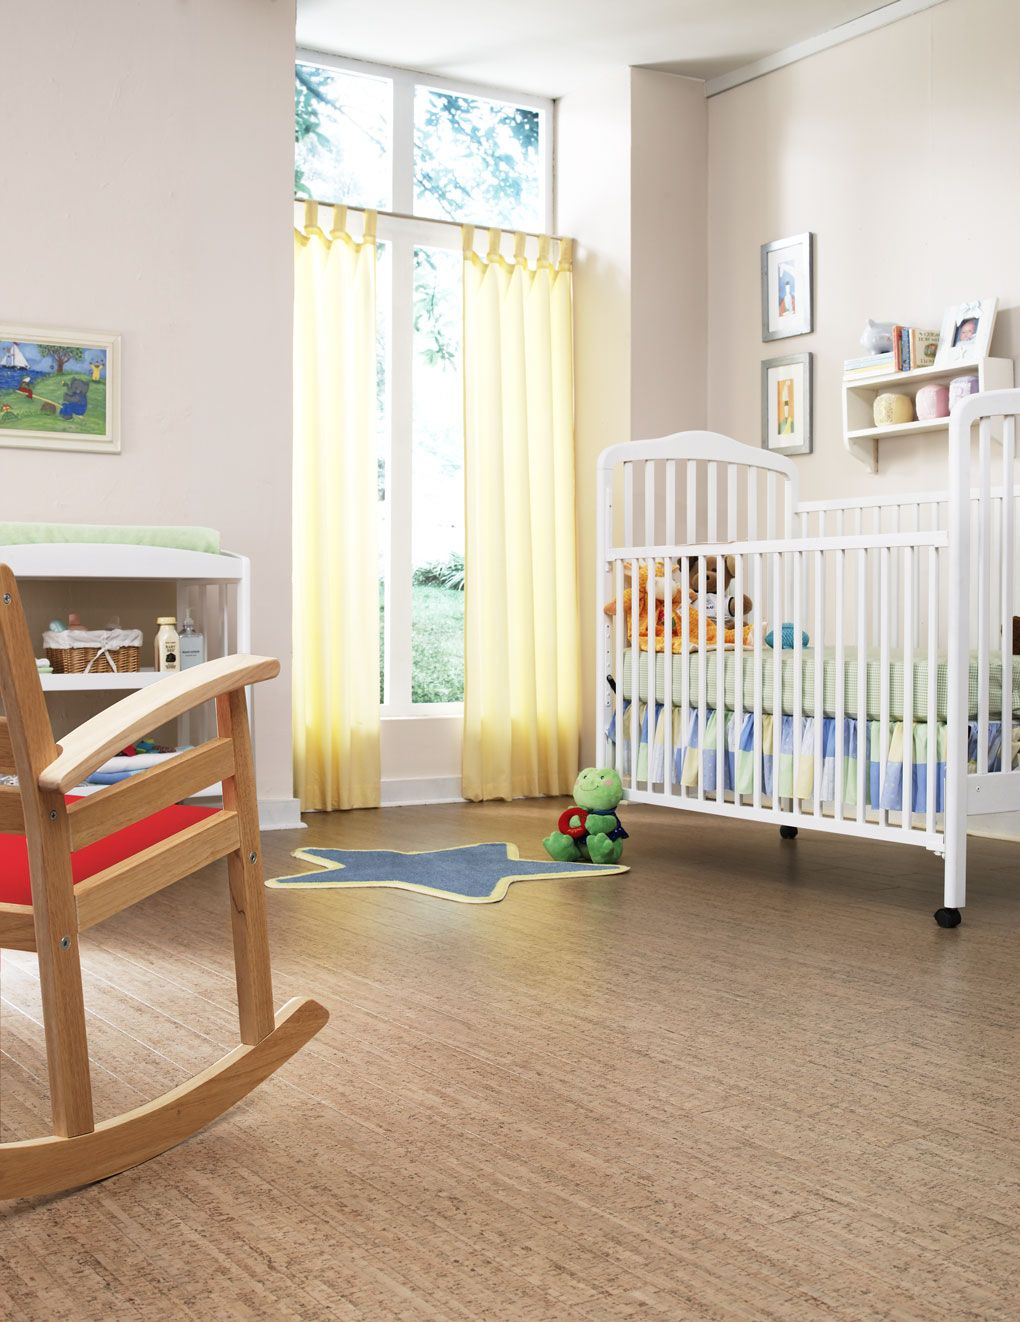 almada cork flooring available at oscar's carpet one. #flooring